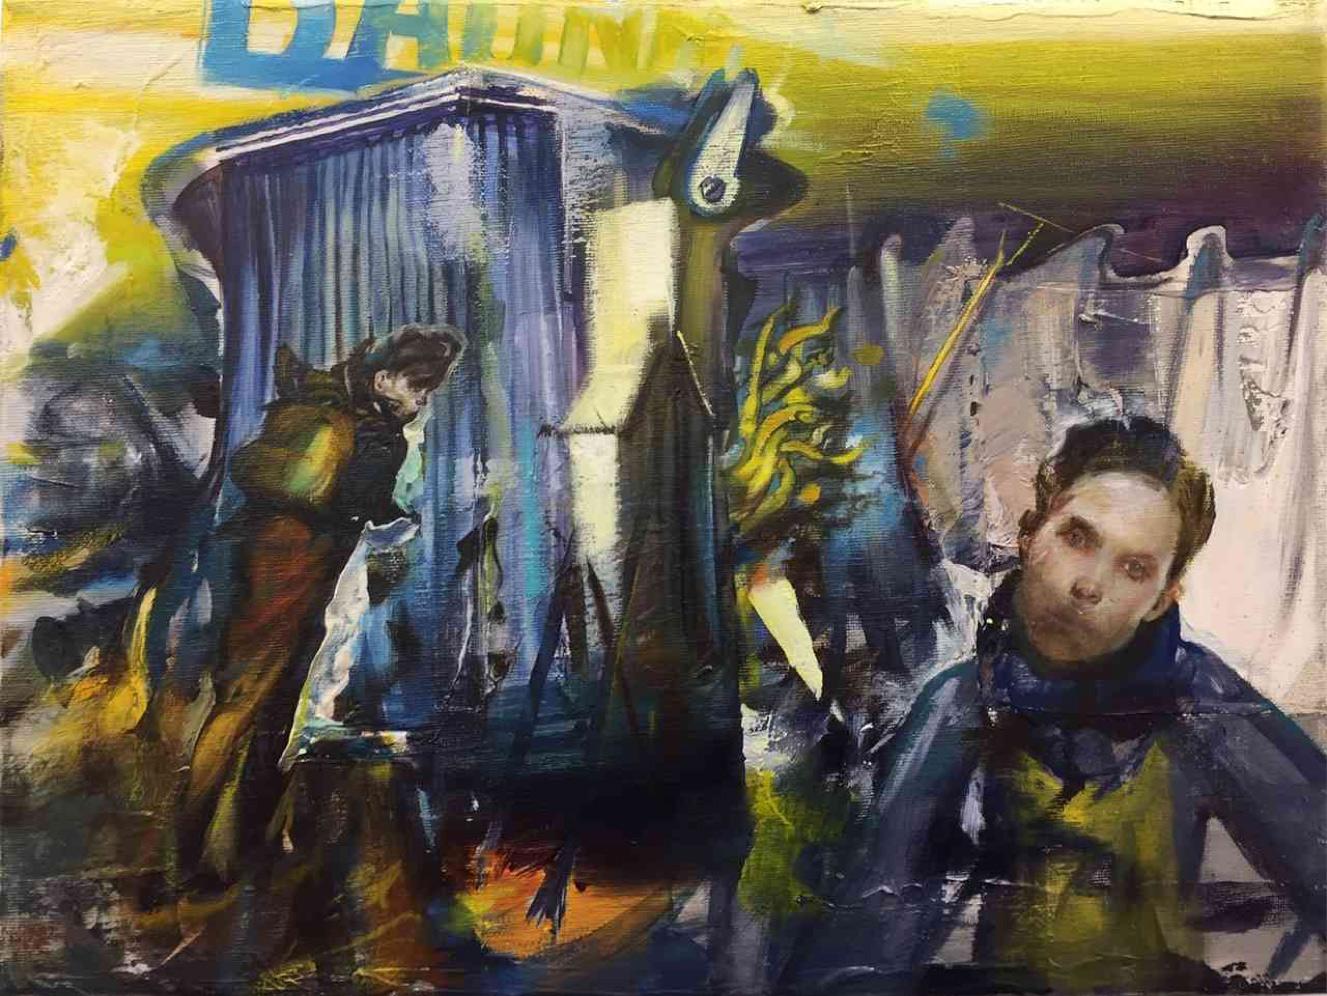 Tassos Missouras, Untitled, Oil on canvas, 30x40 cm, 2019